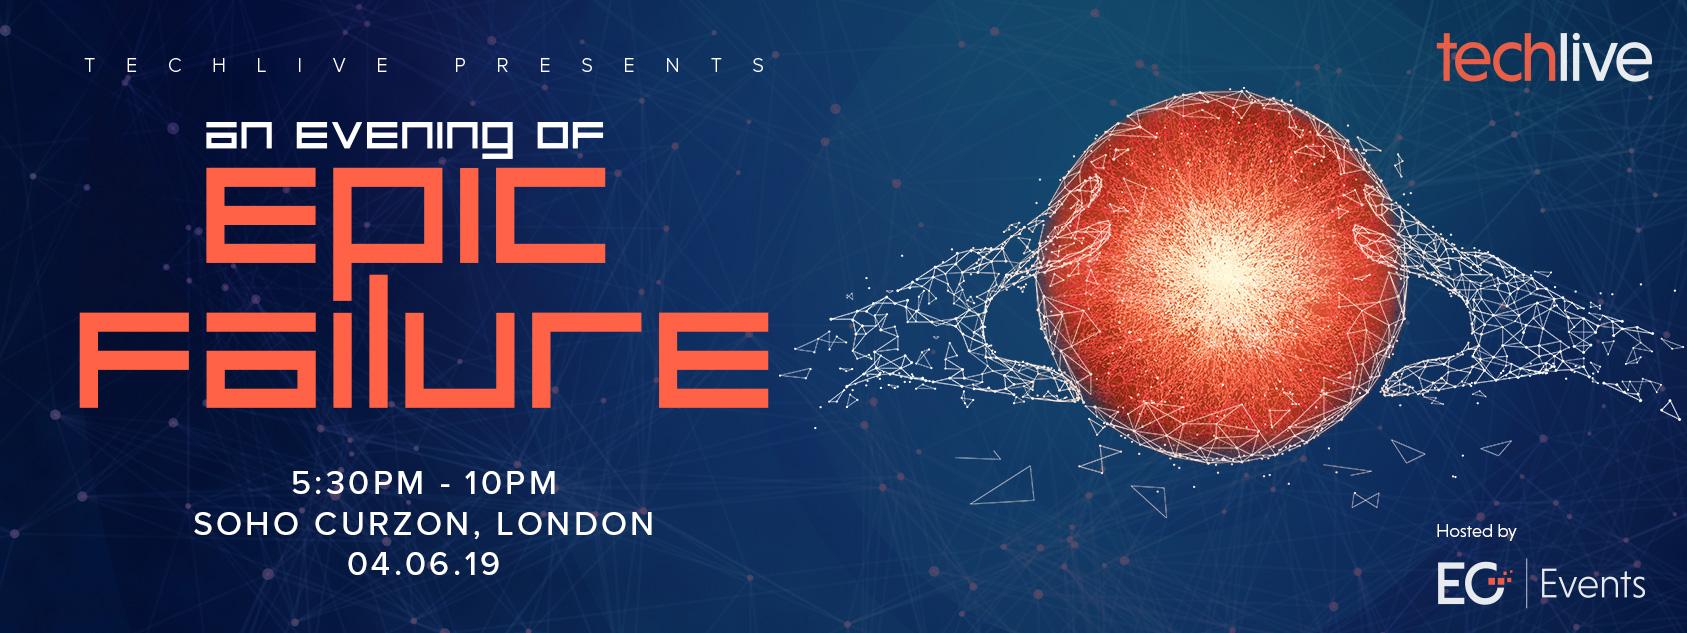 EG Tech Live | London - Soho